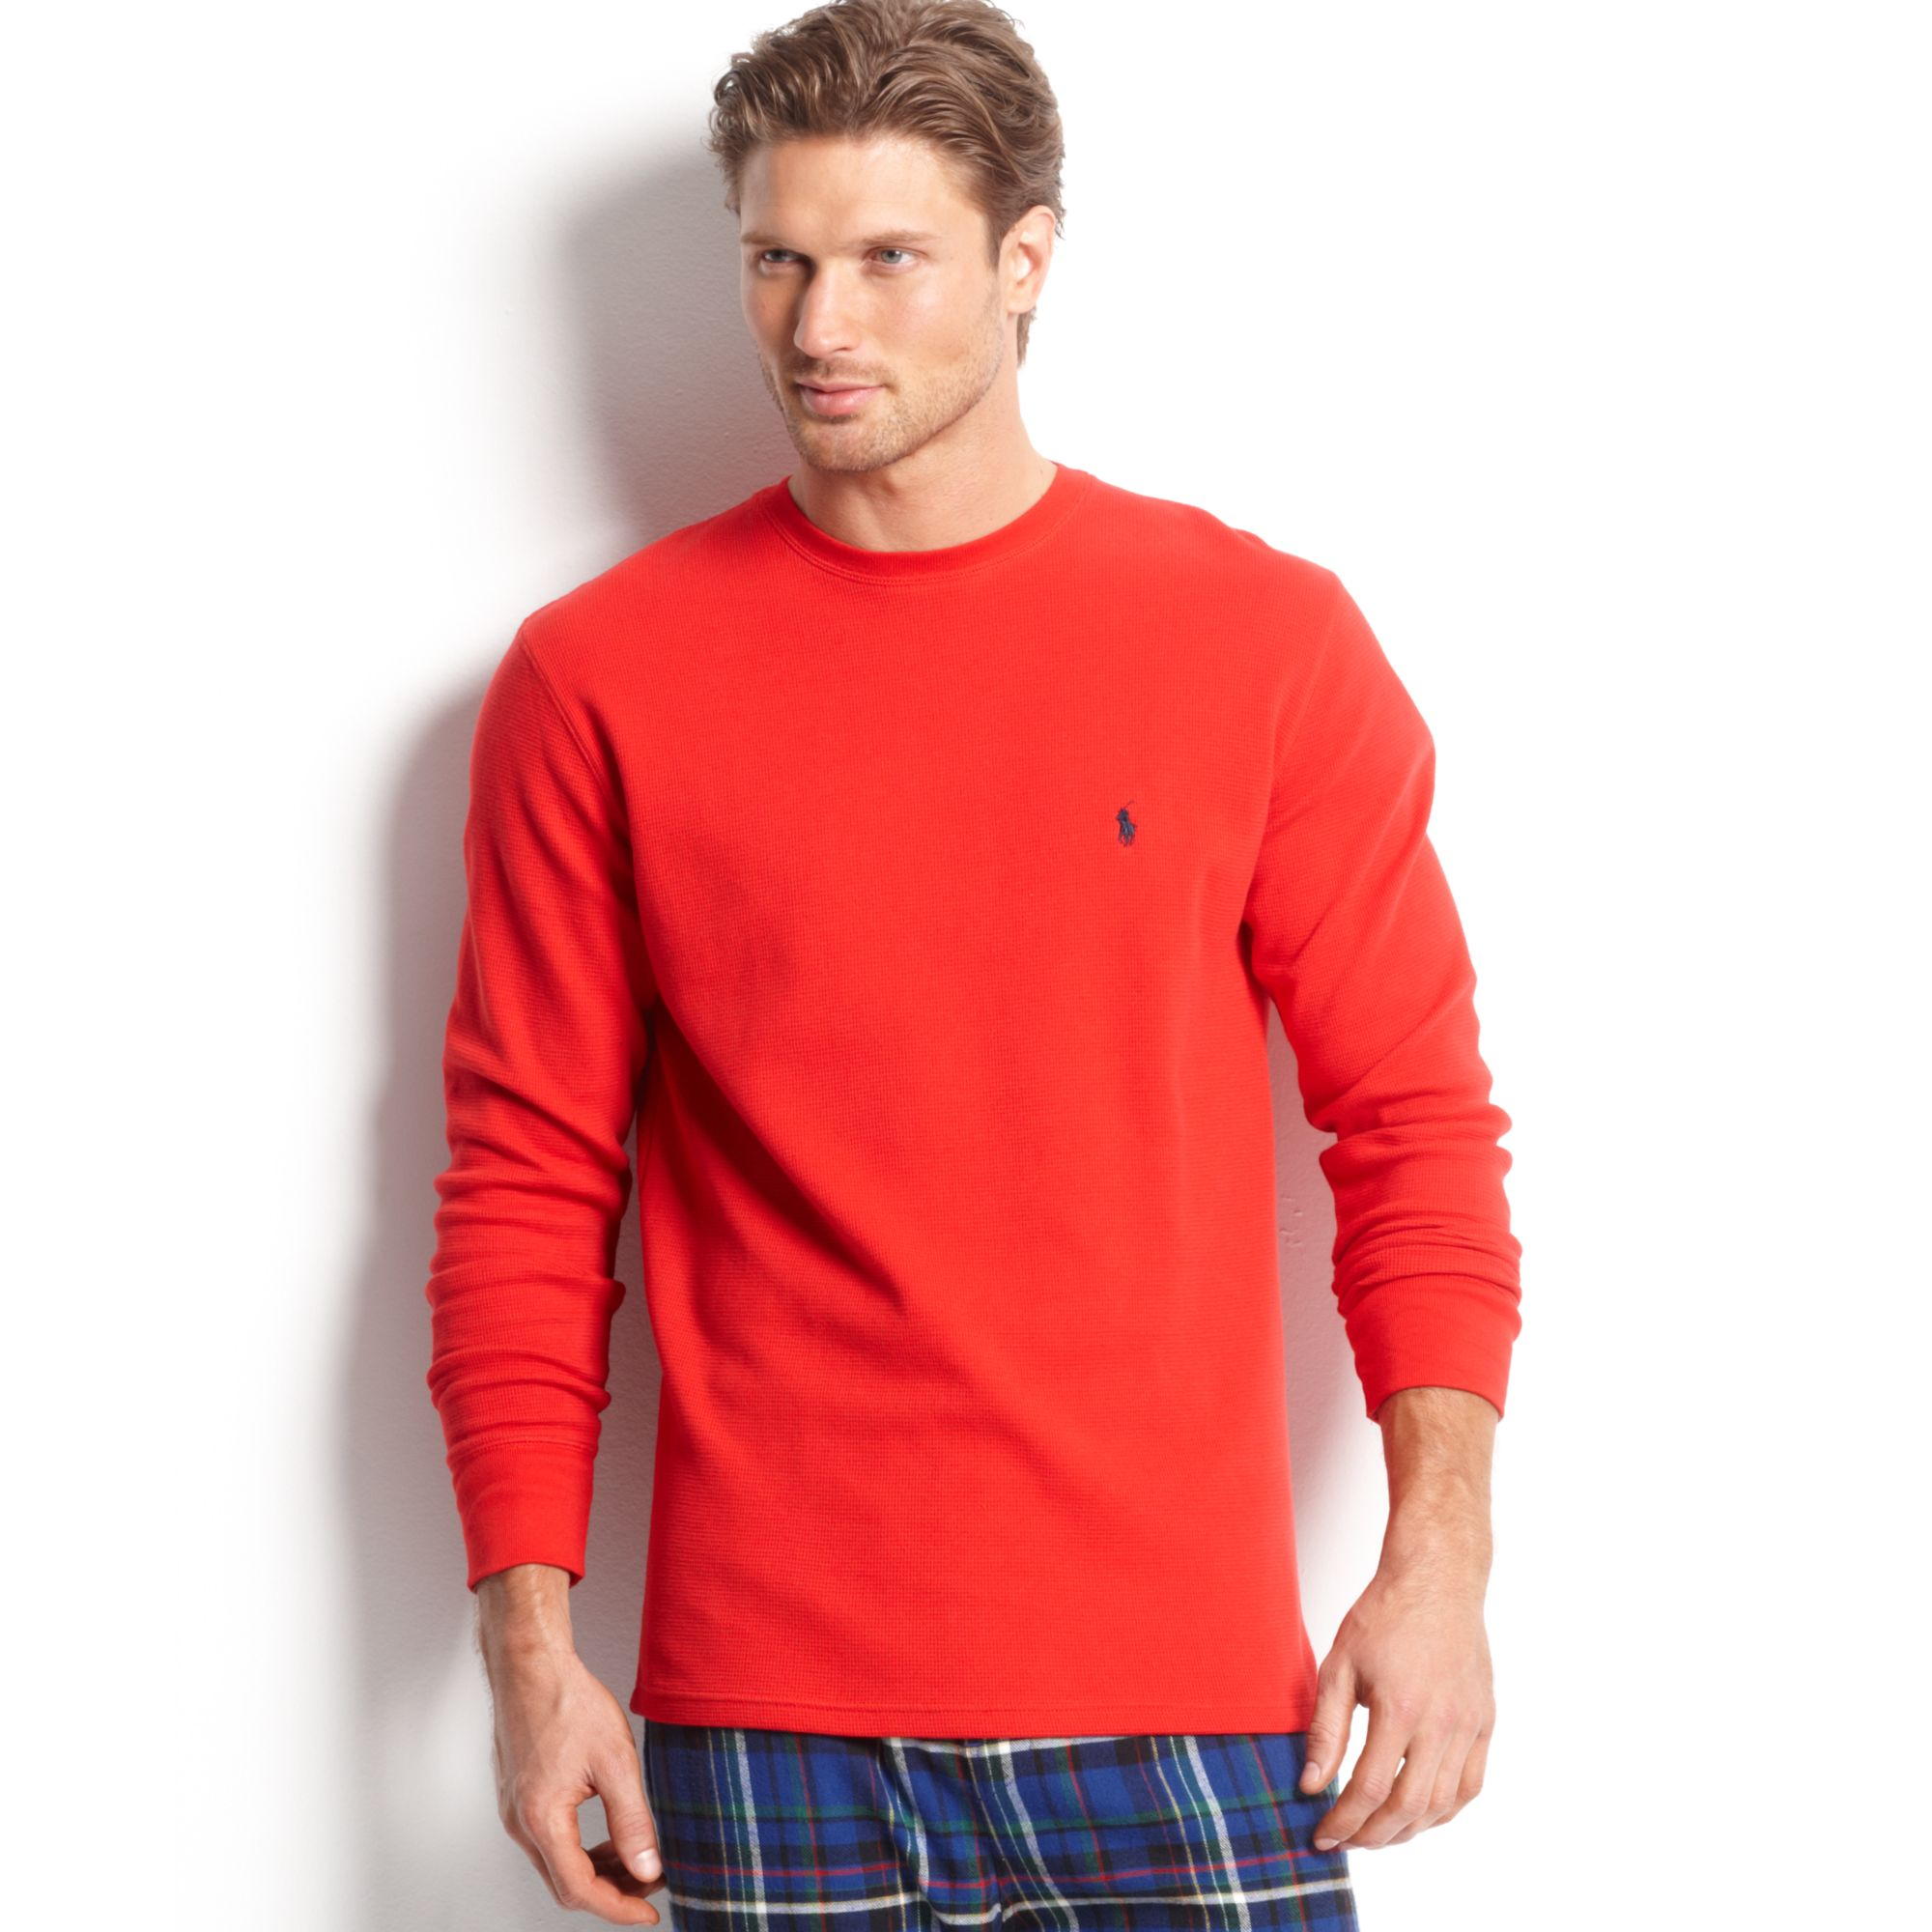 Lauren Shirt T Long Red Crew Men Neck Ralph Thermal Sleeve Waffleknit For WxBoerdCQE